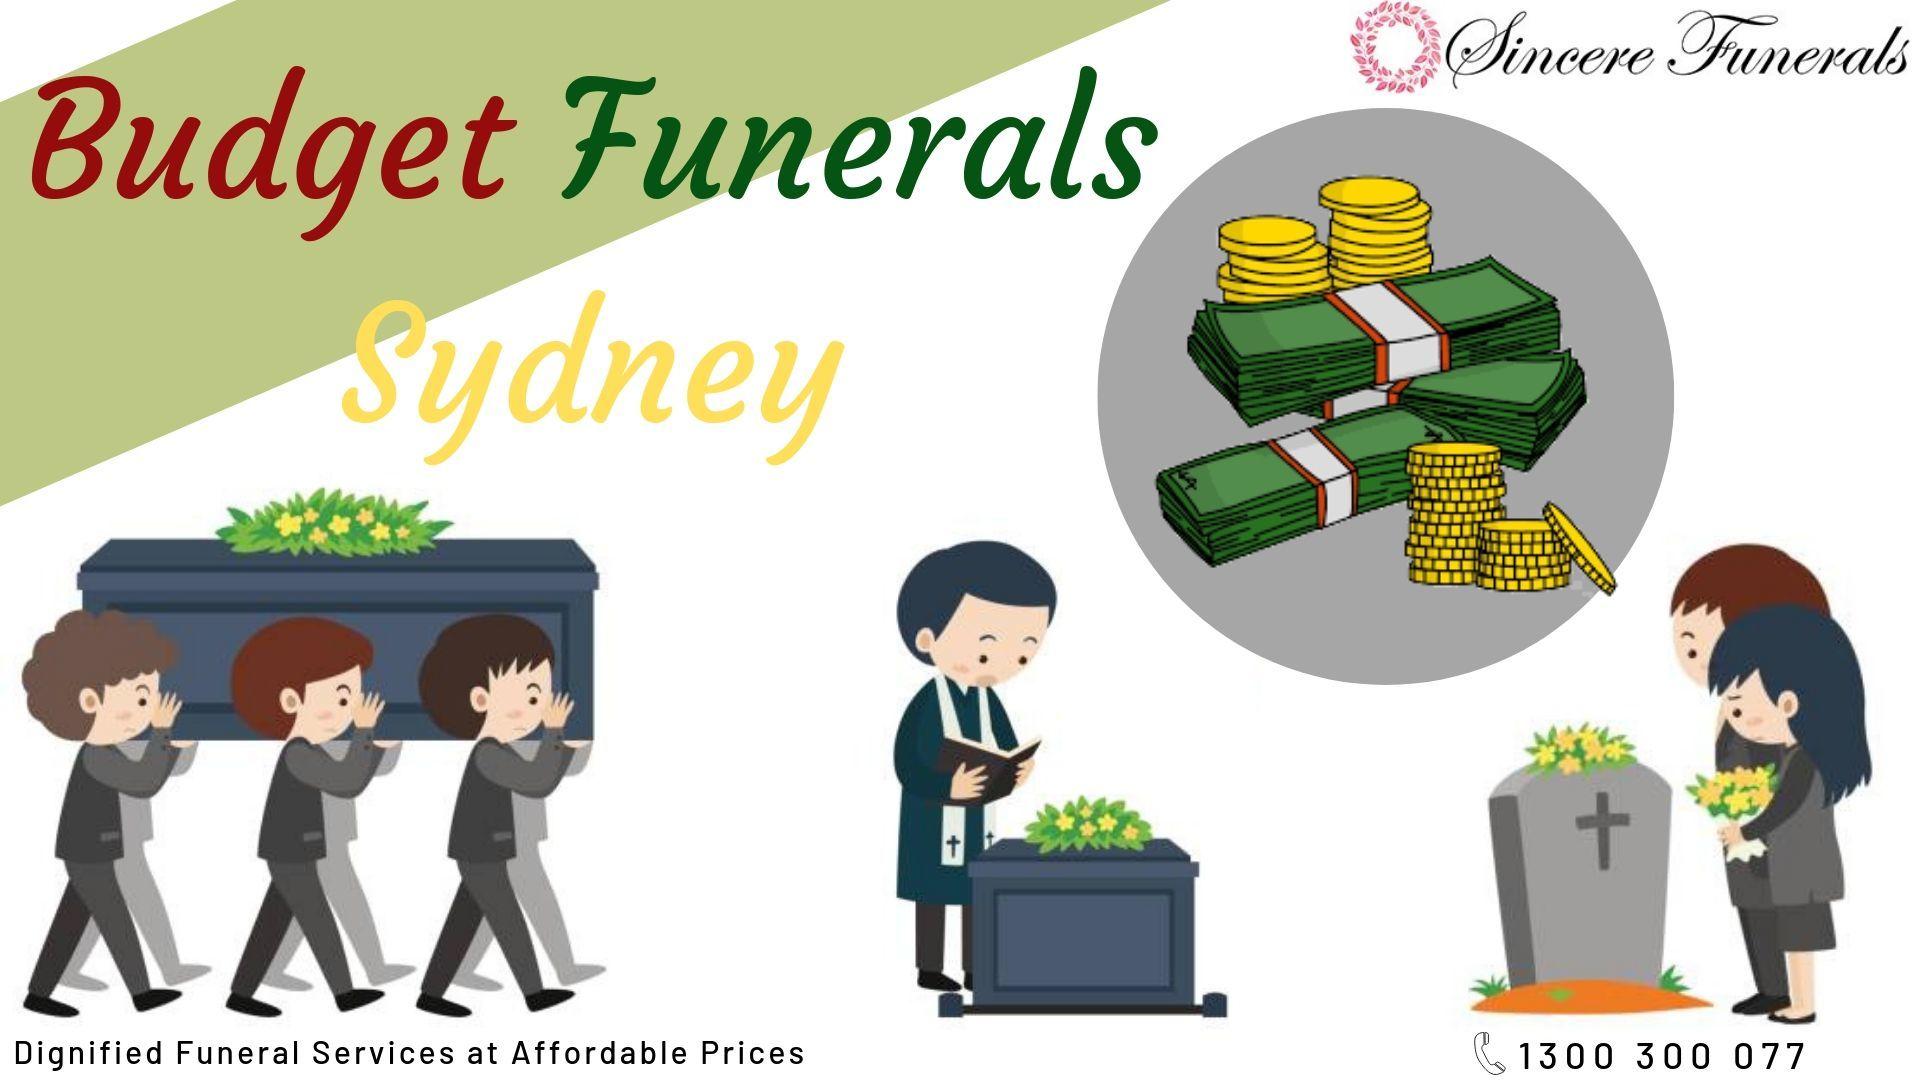 Budget Funerals Sydney